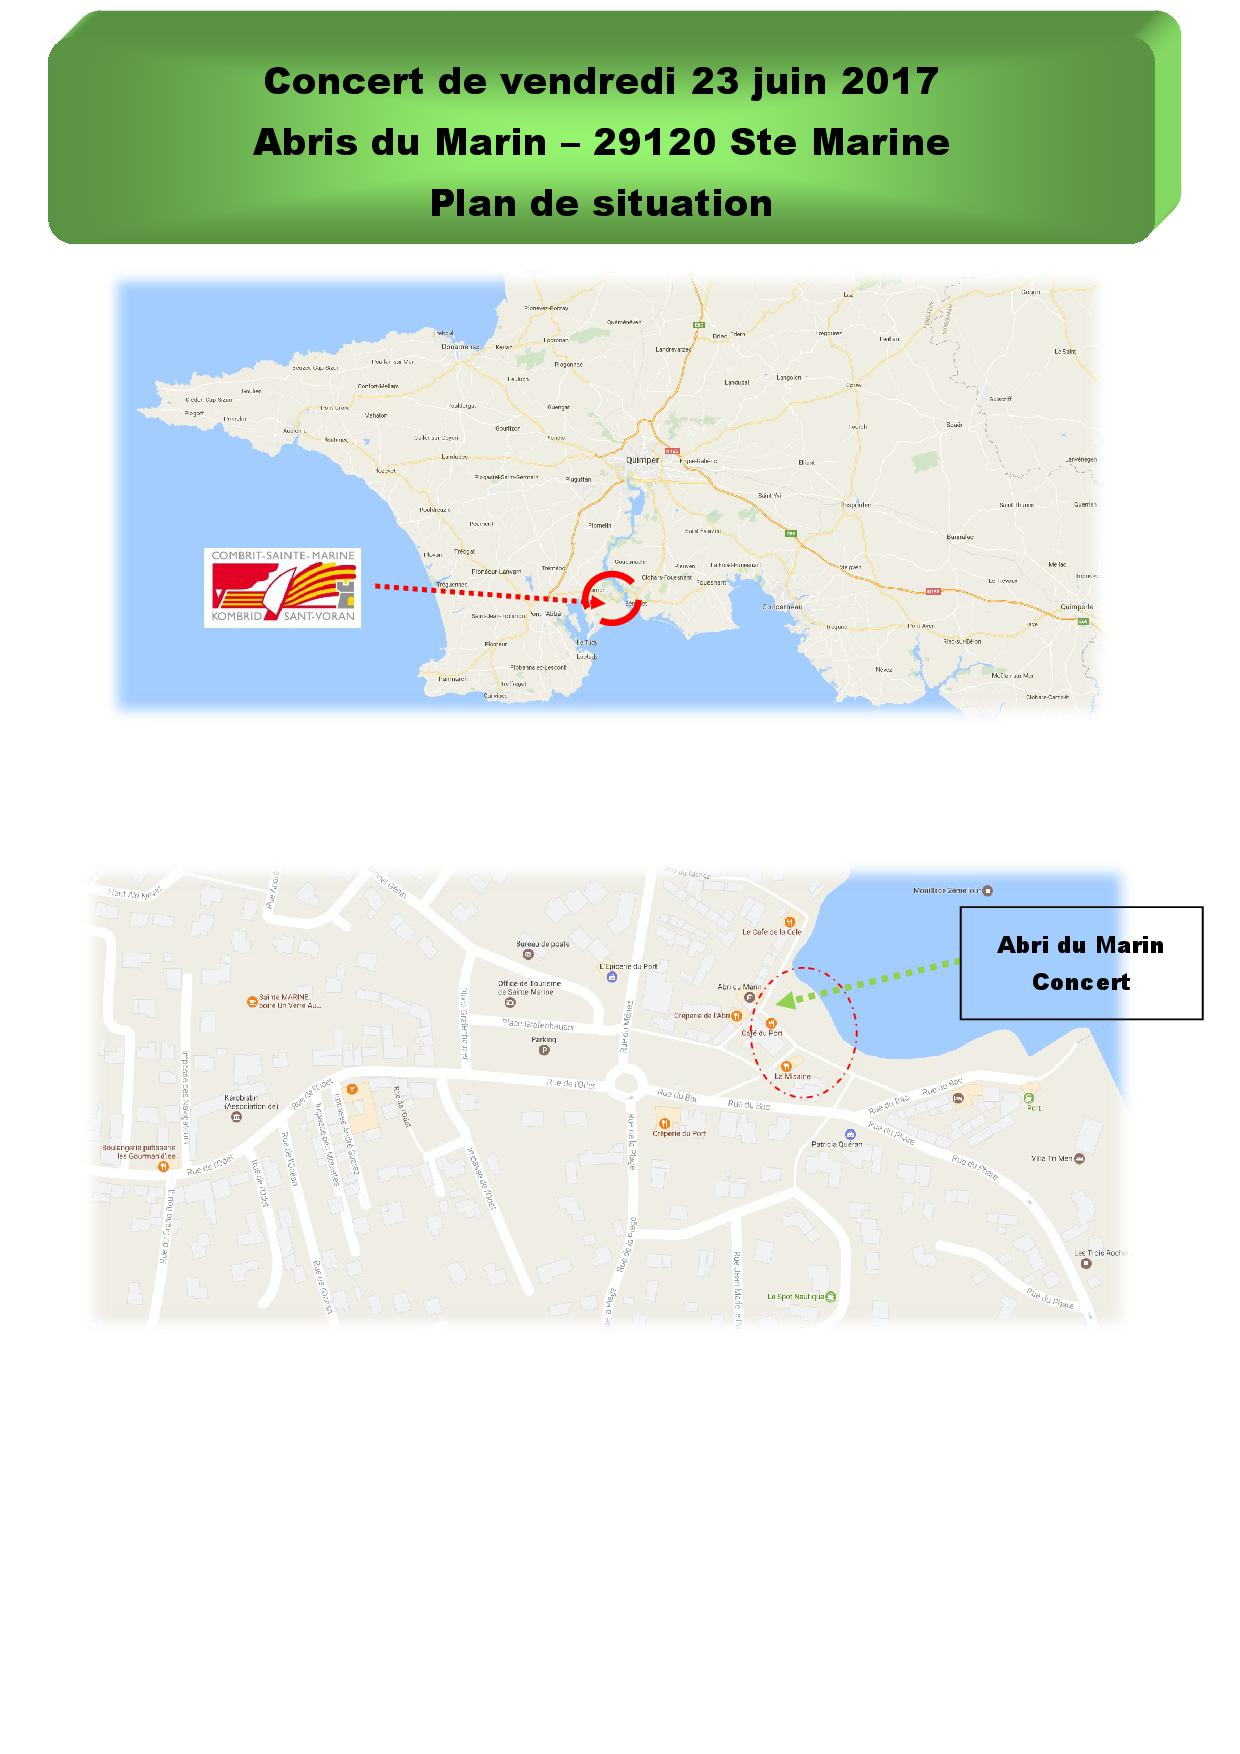 plan situation de st marine 230617.png.jpg